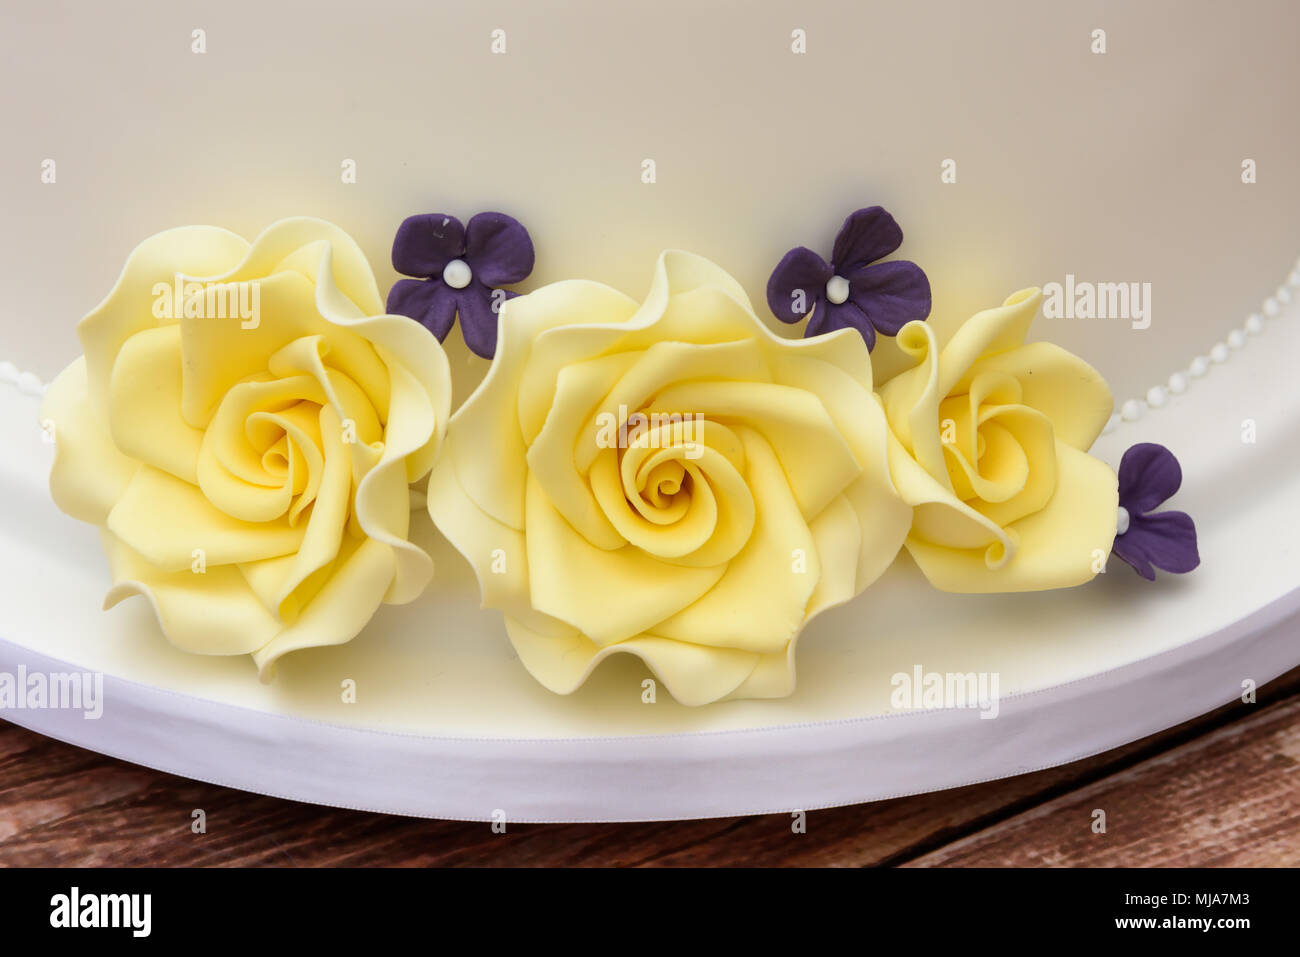 Star wars themed wedding cake - Stock Image